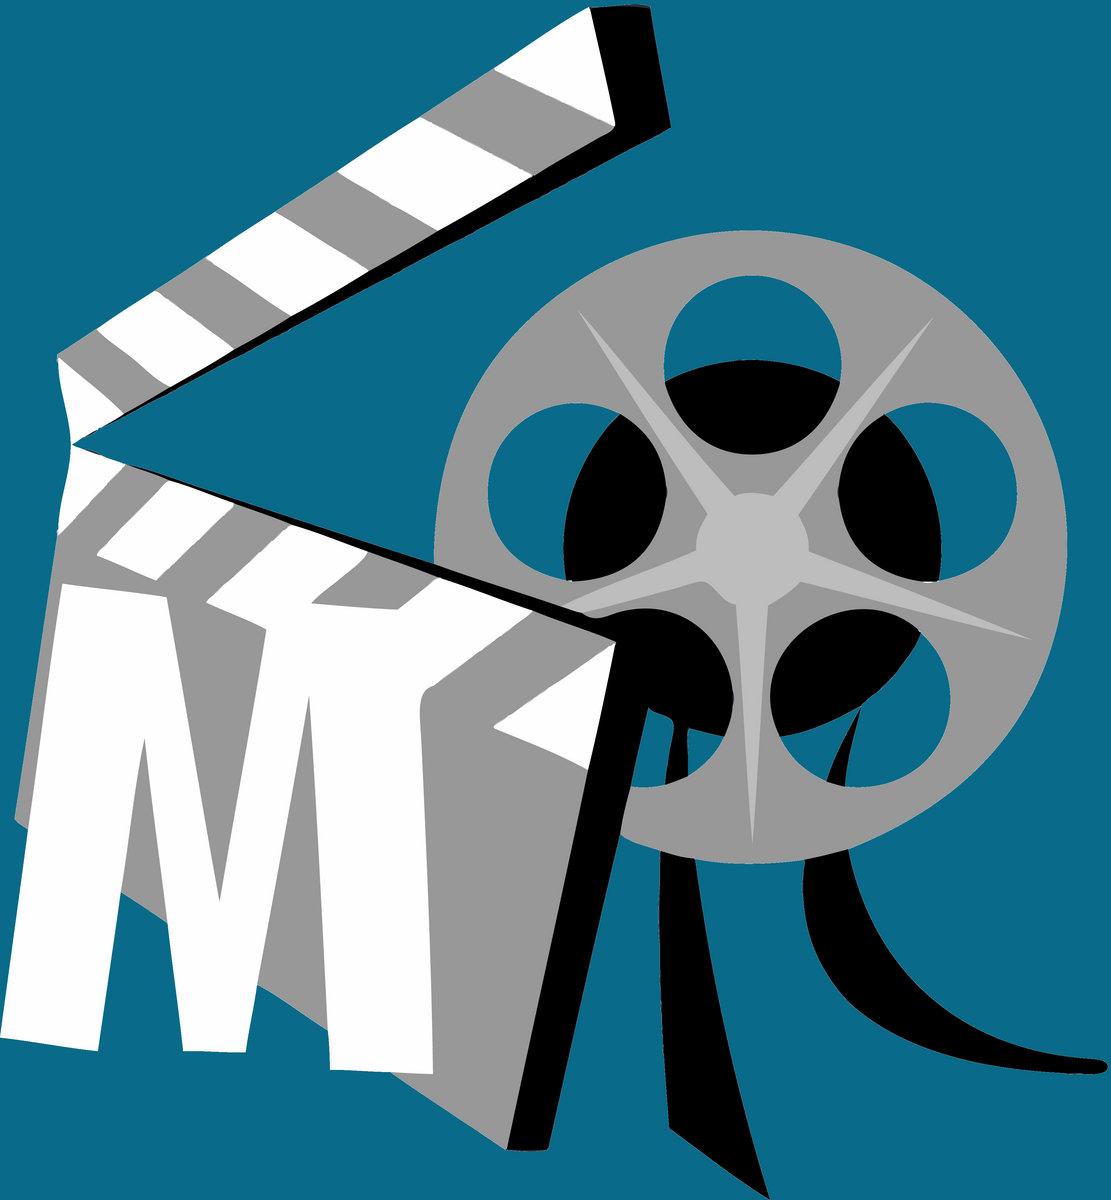 Download piranha 3d hd torrent and piranha 3d movie yify subtitles.